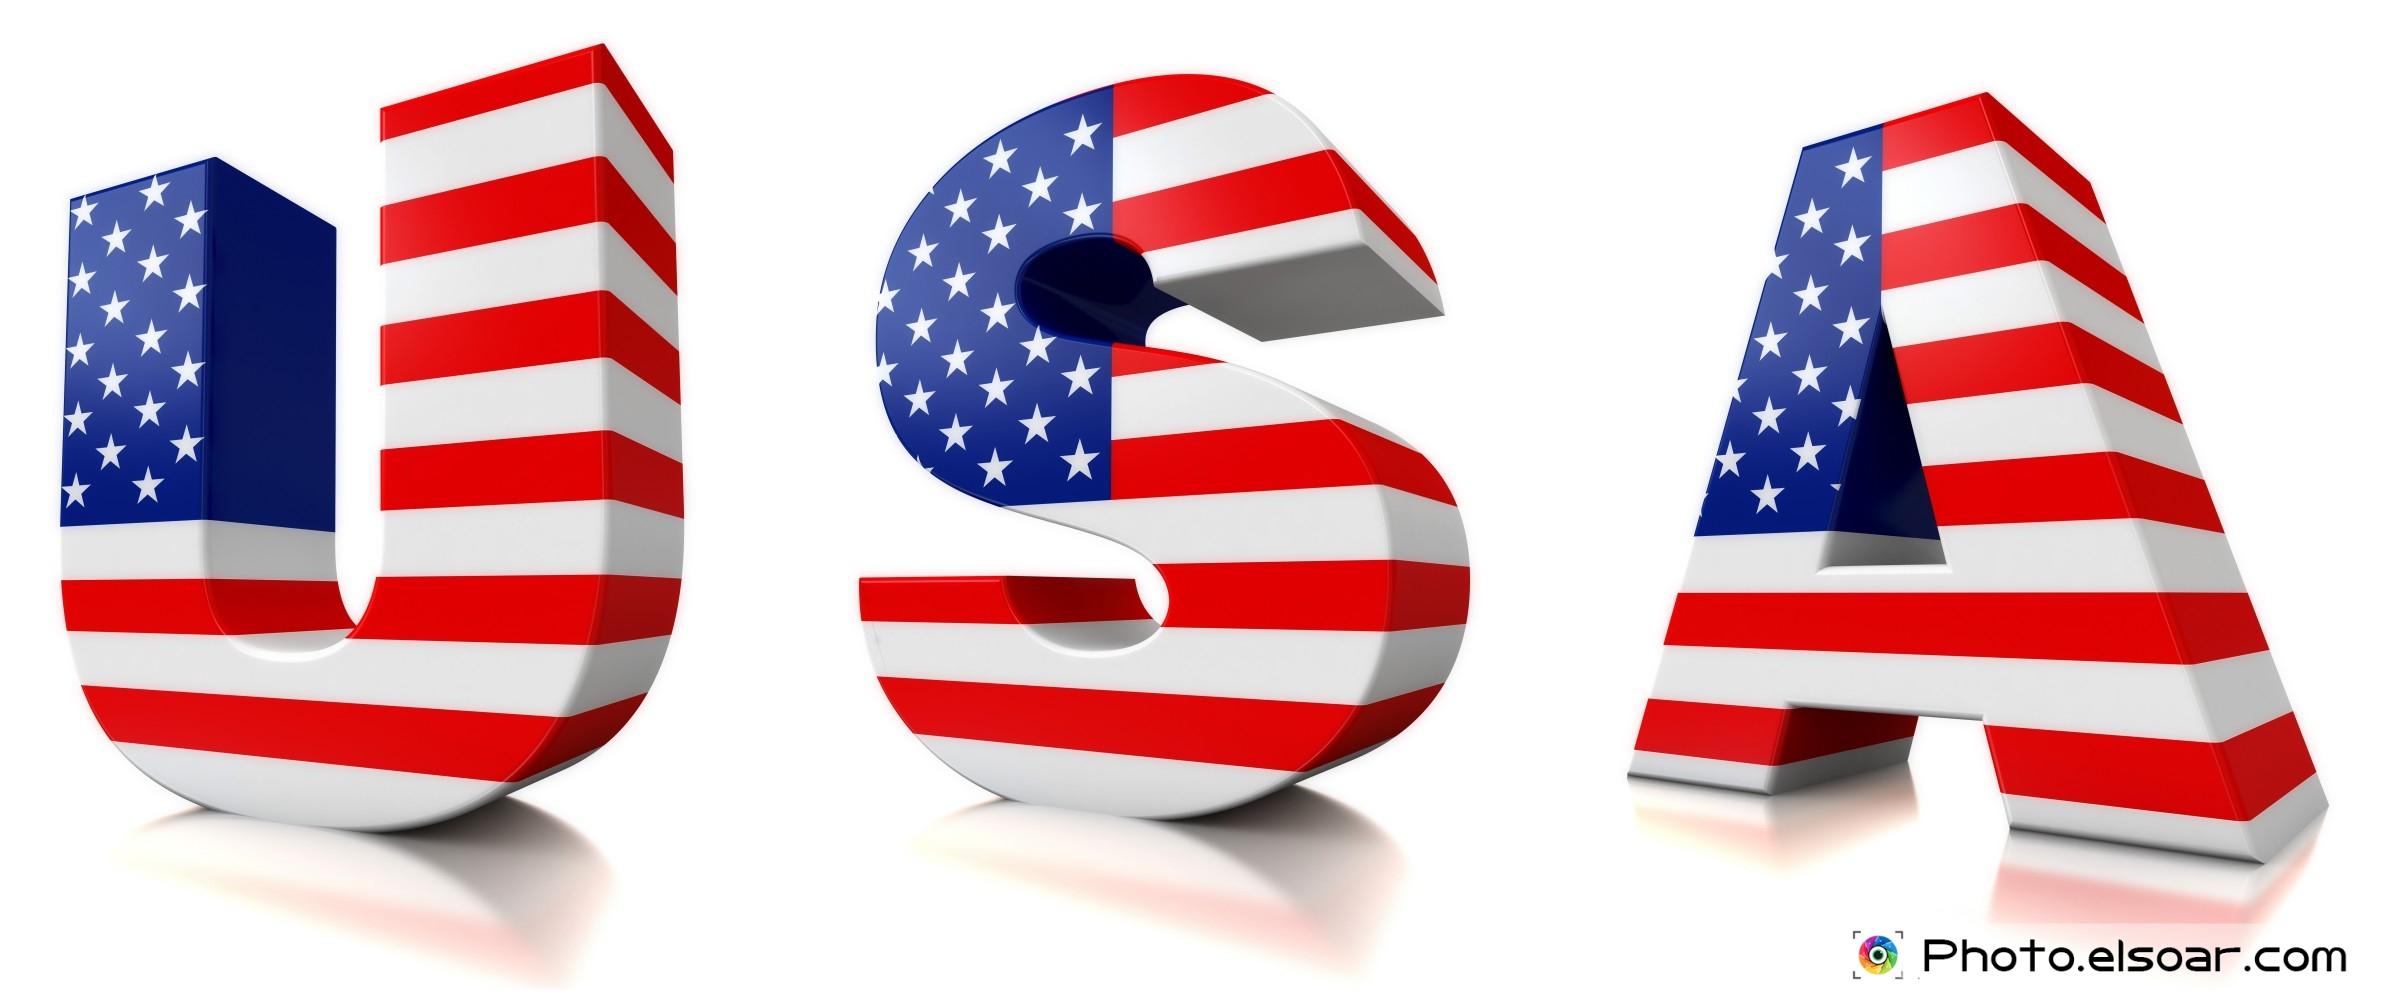 8 American Flag Font Images